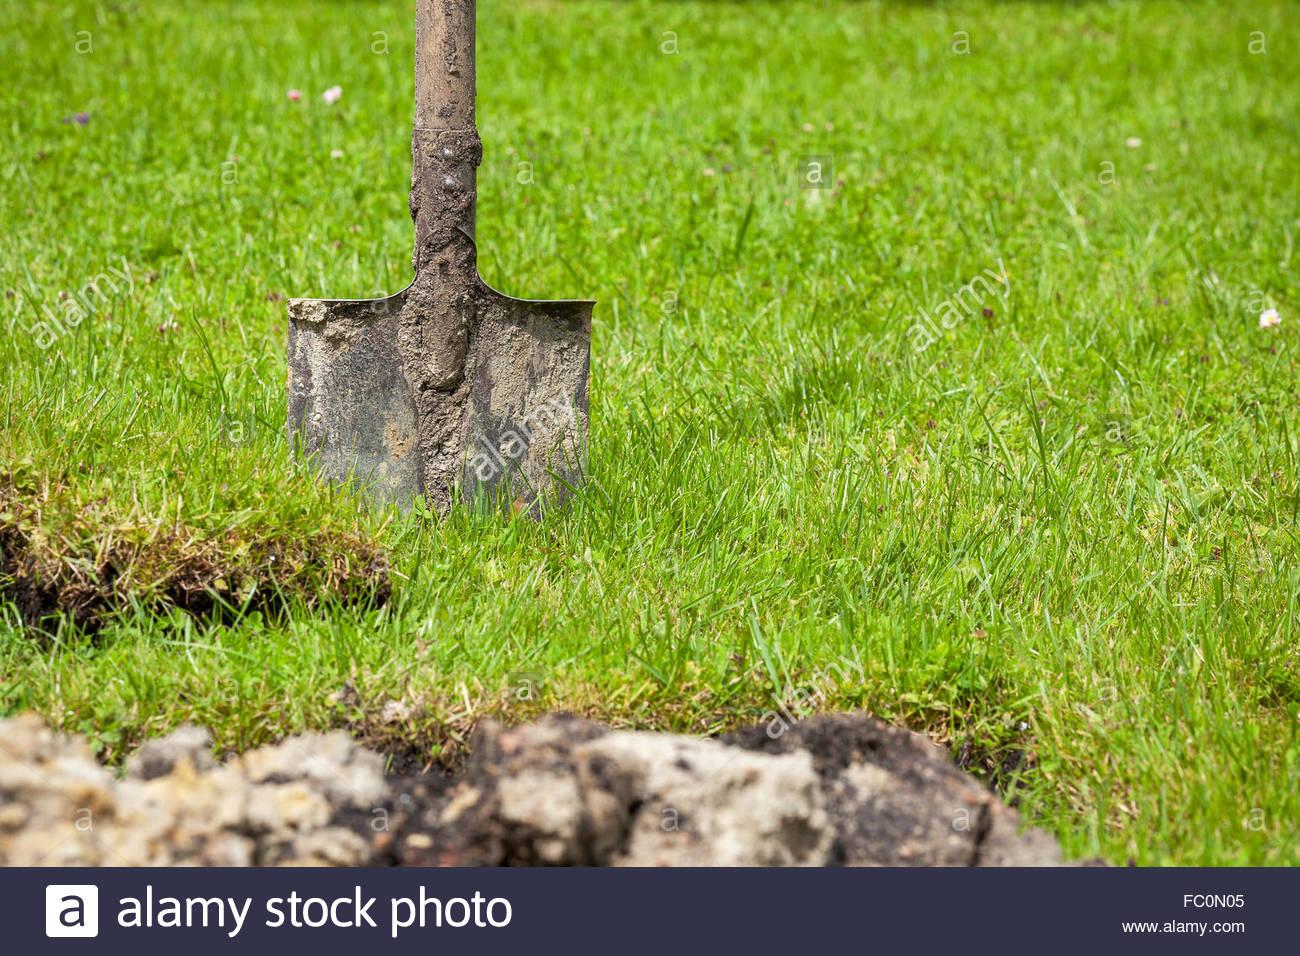 Spade in garden - Stock Image